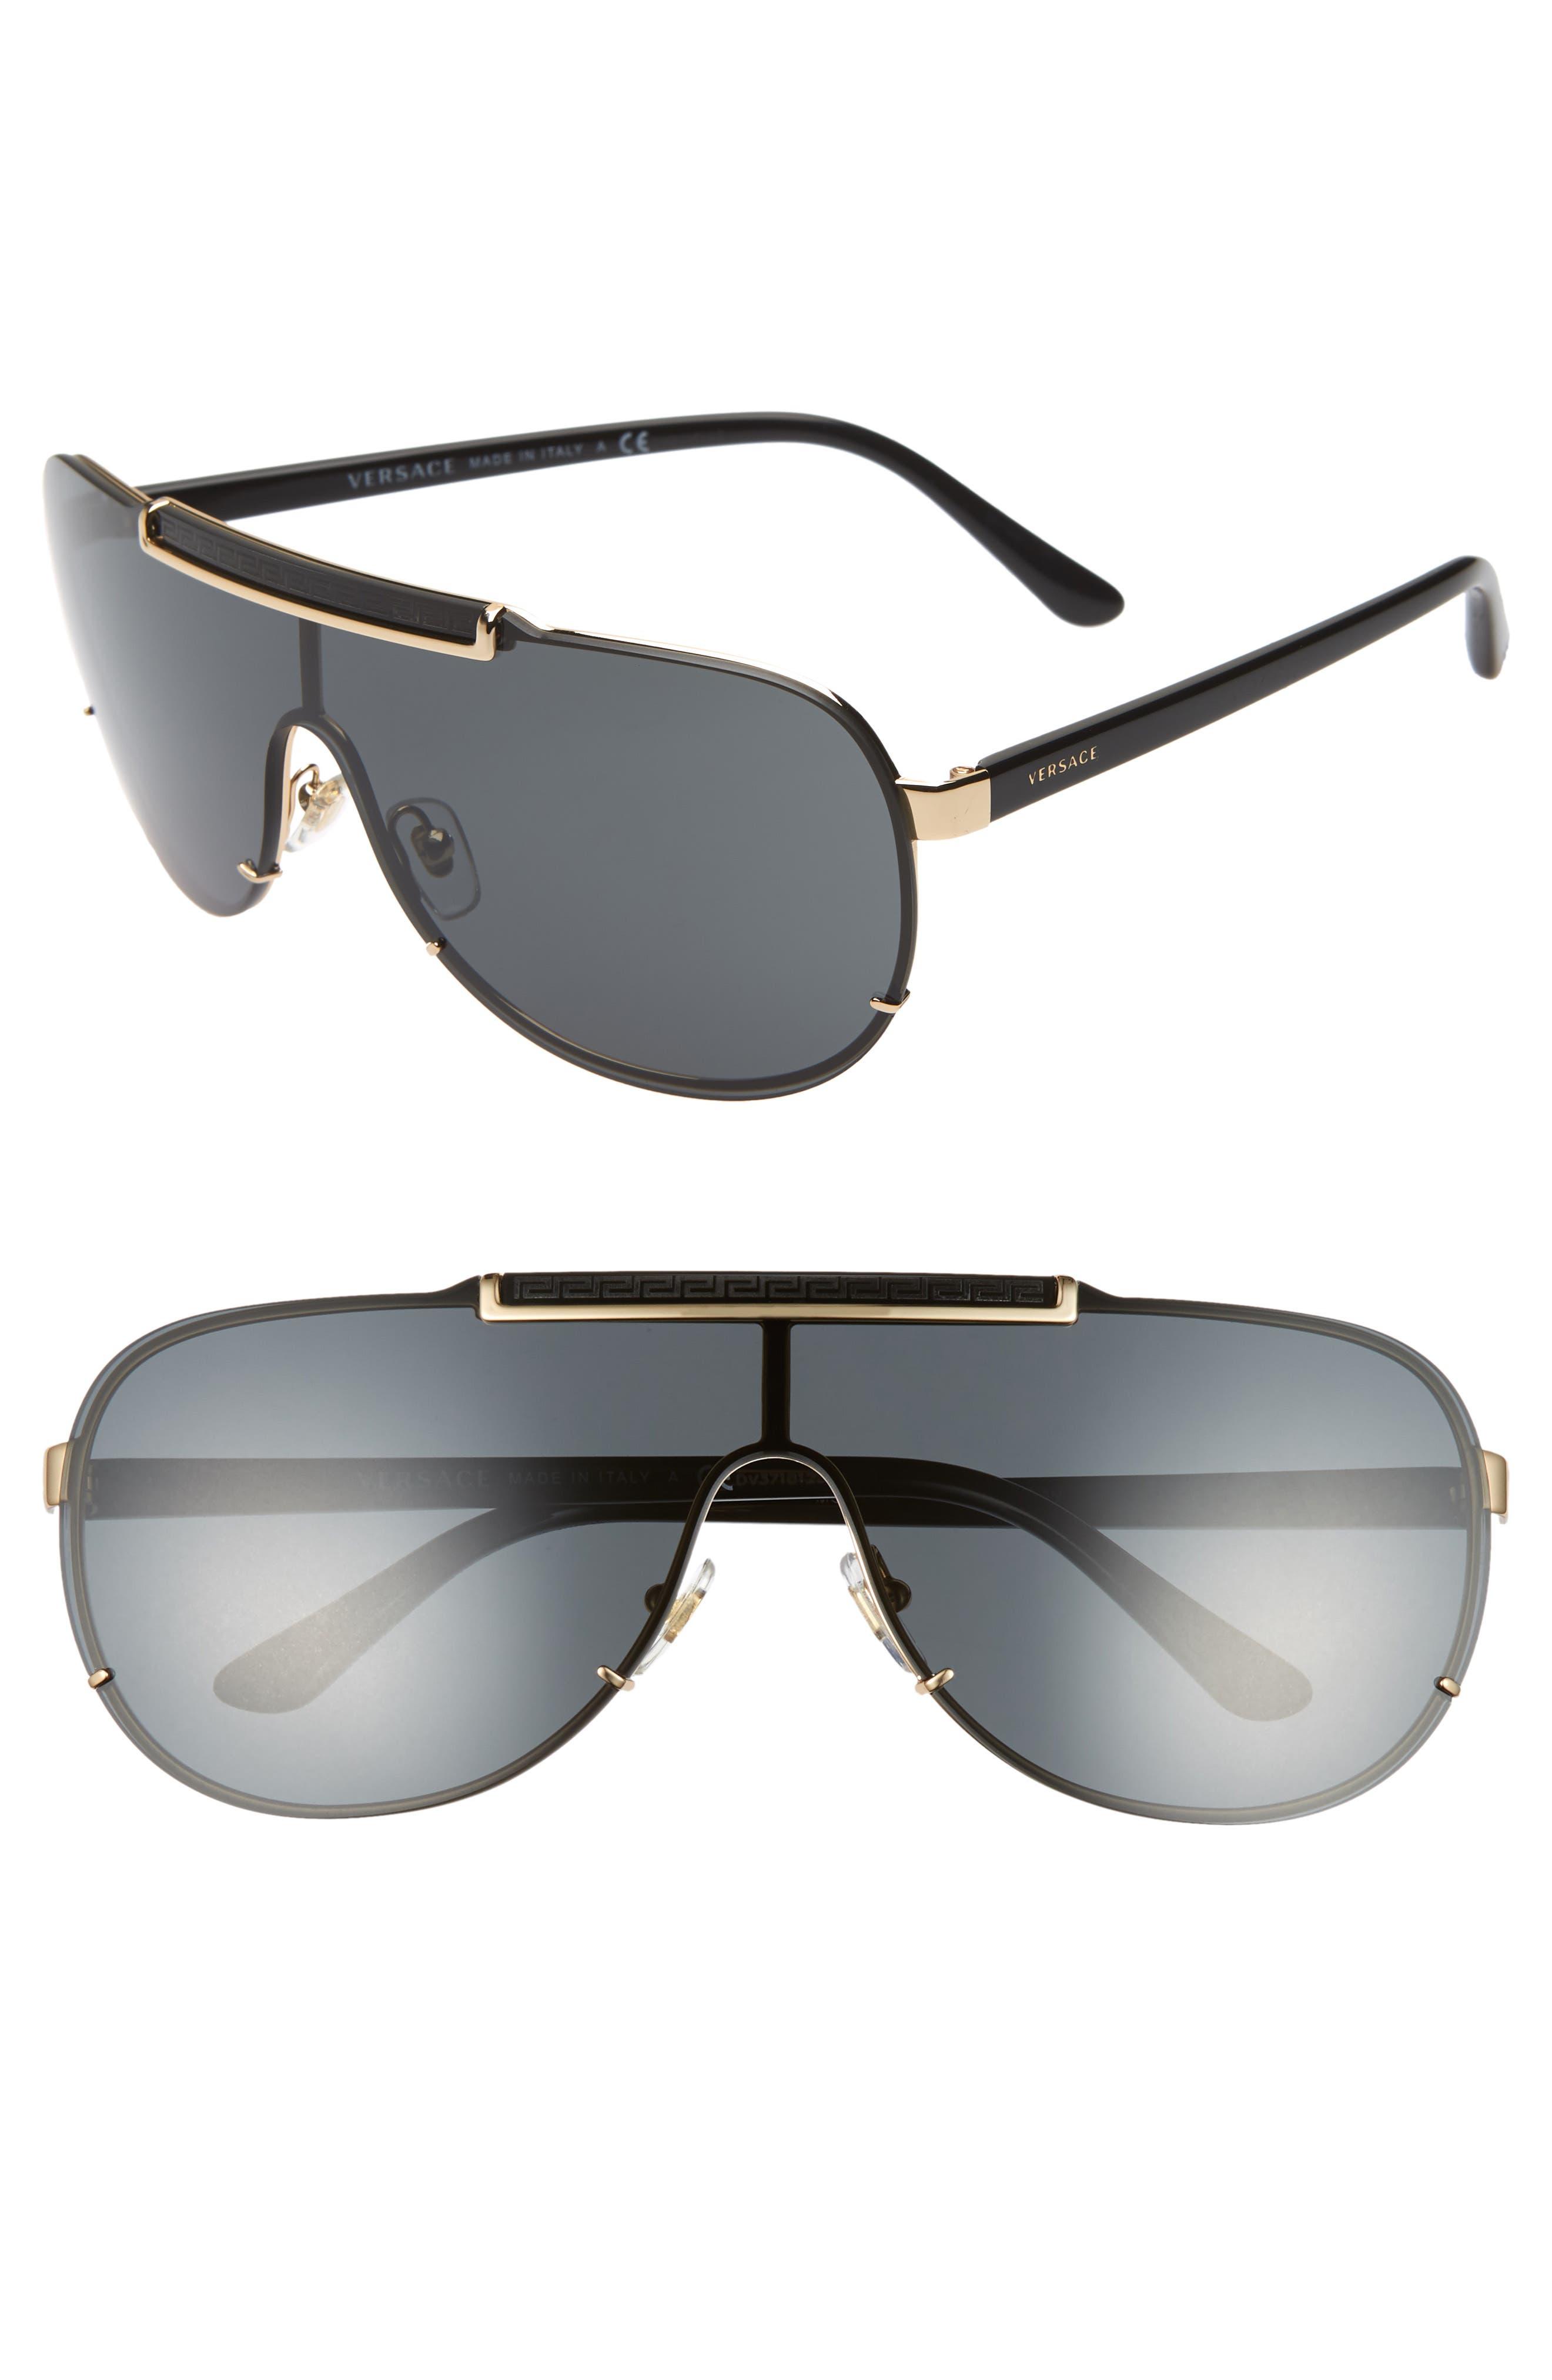 40mm Shield Sunglasses,                             Main thumbnail 1, color,                             007